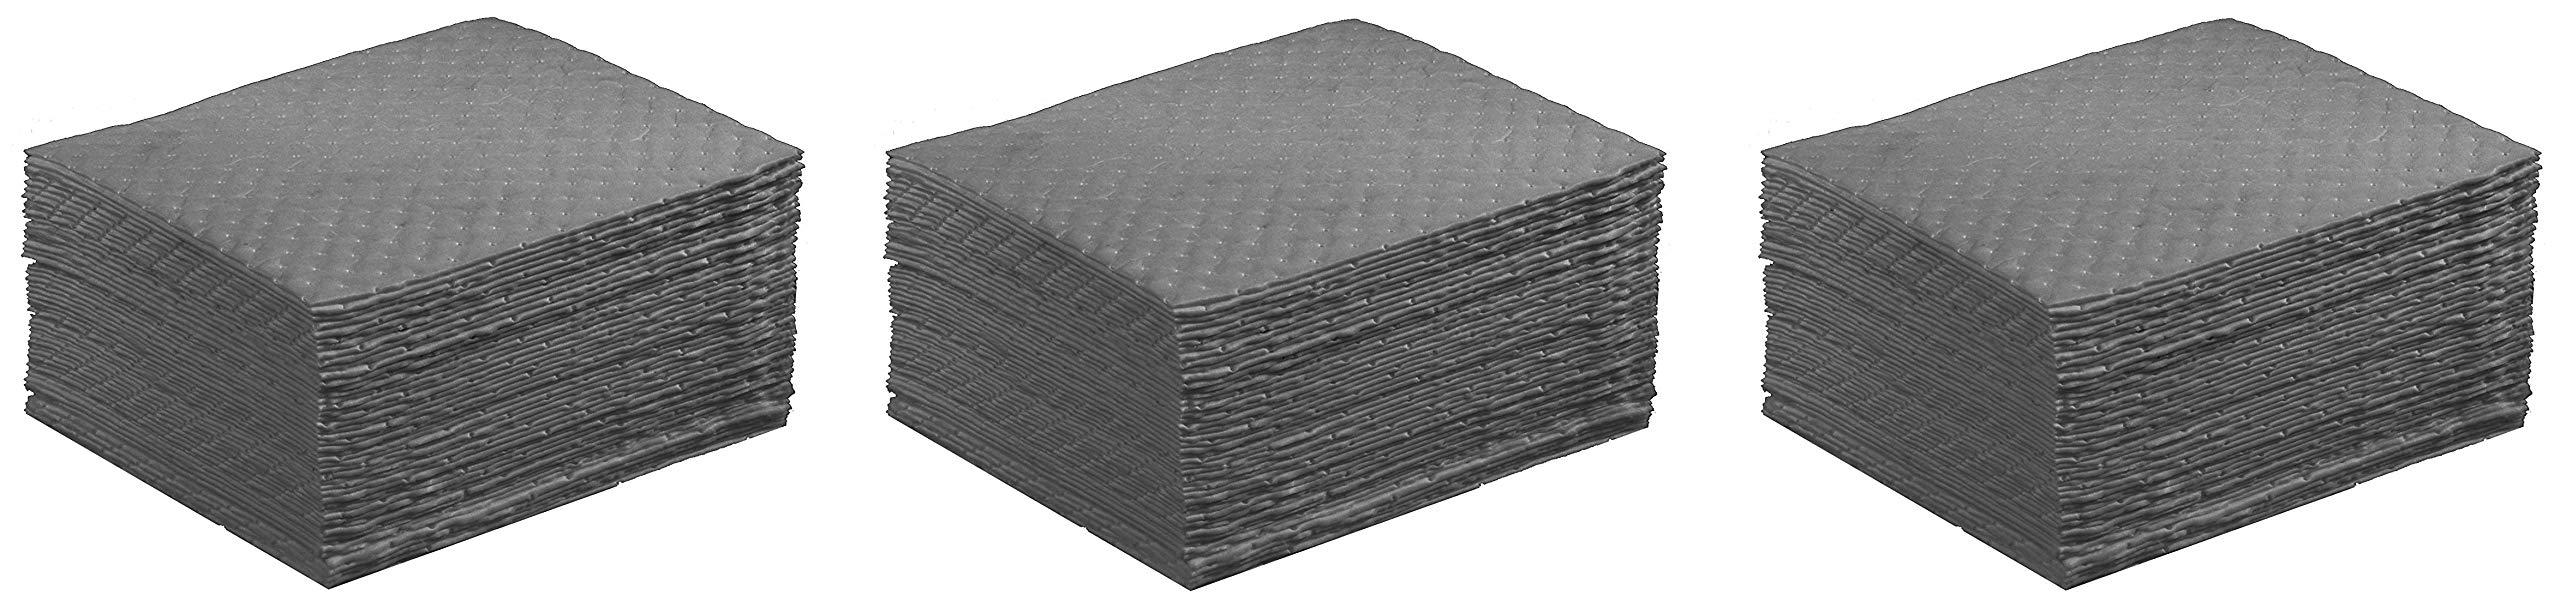 ESP 1AMGPL Airmatrix Polypropylene Heavy Weight Maintenance Universal Absorbent Laminated Pad, 18'' Length x 16'' Width, Gray (100 Per Bale) (3 X 100 Per Bale)